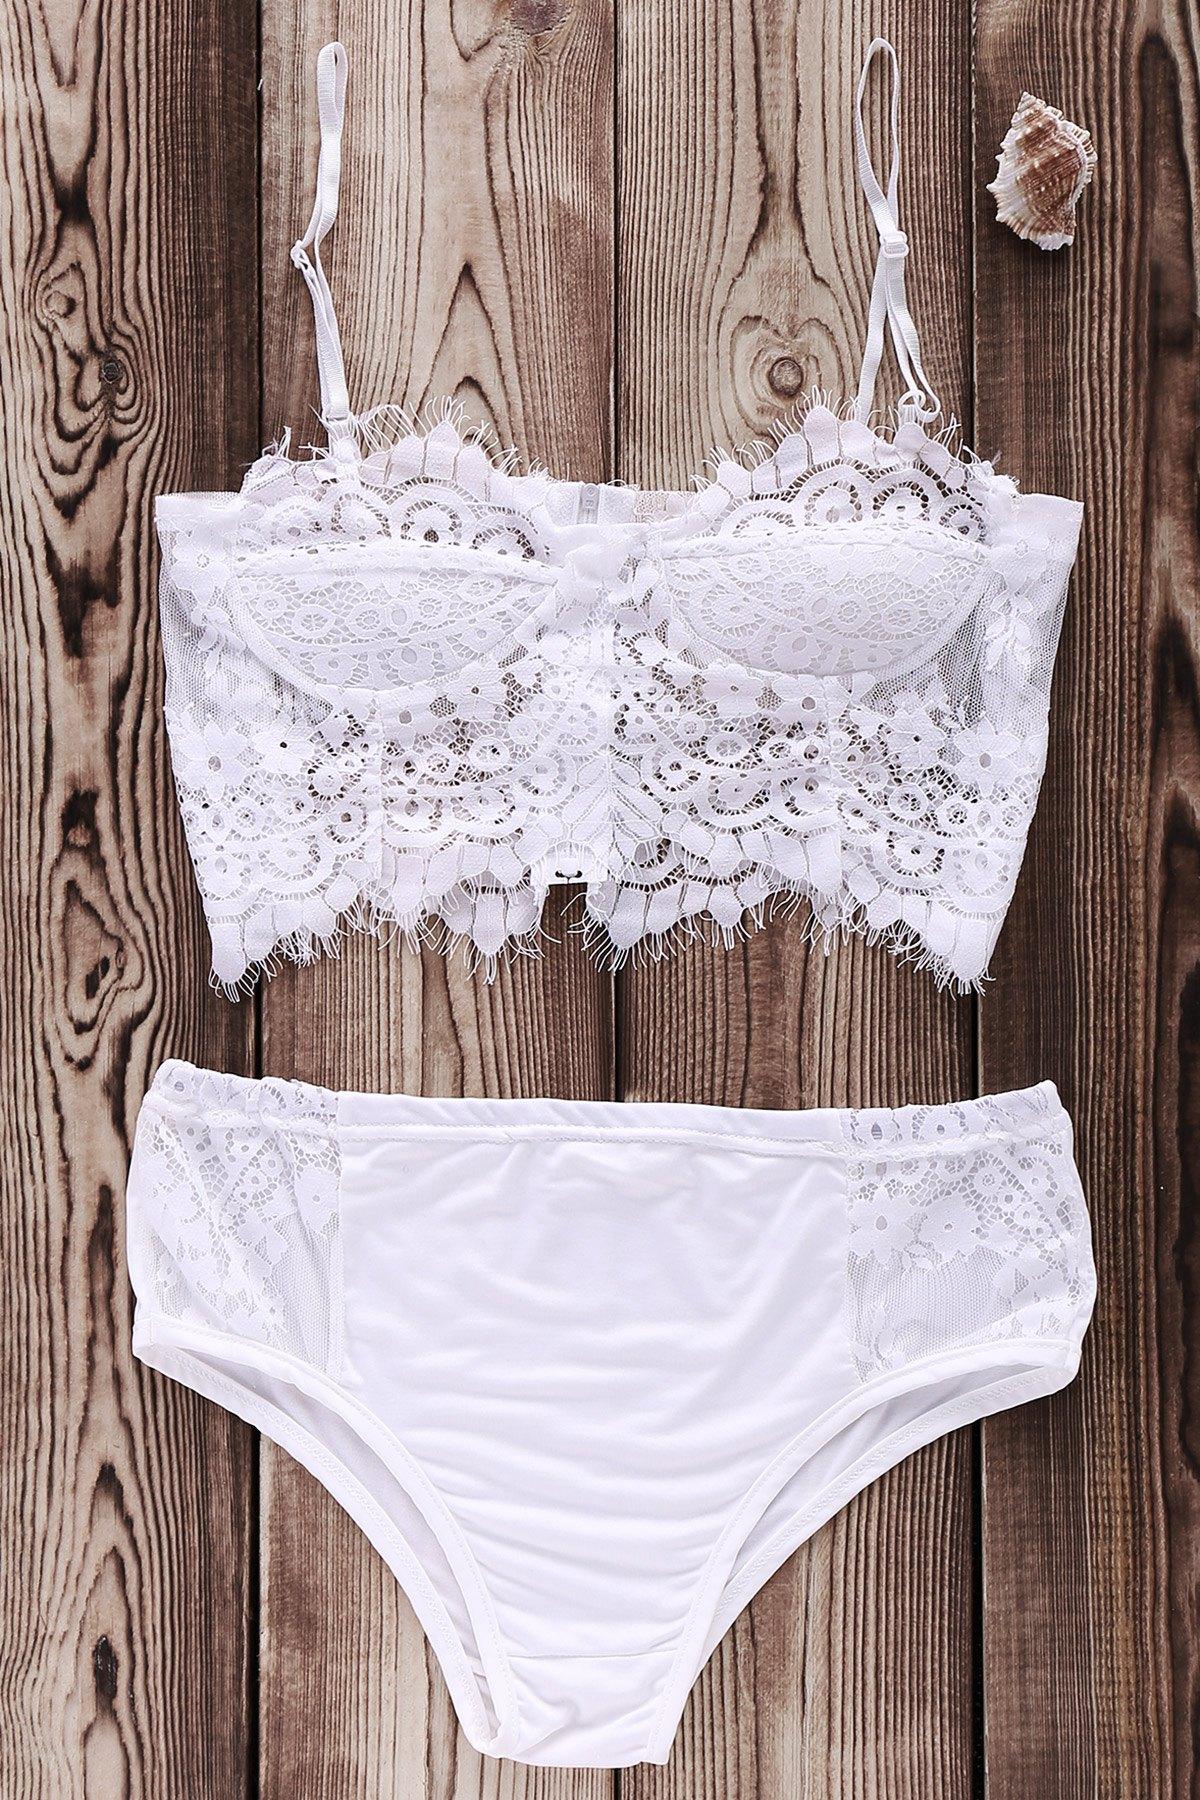 Cami White Lace Splicing Bikini Set 176203102